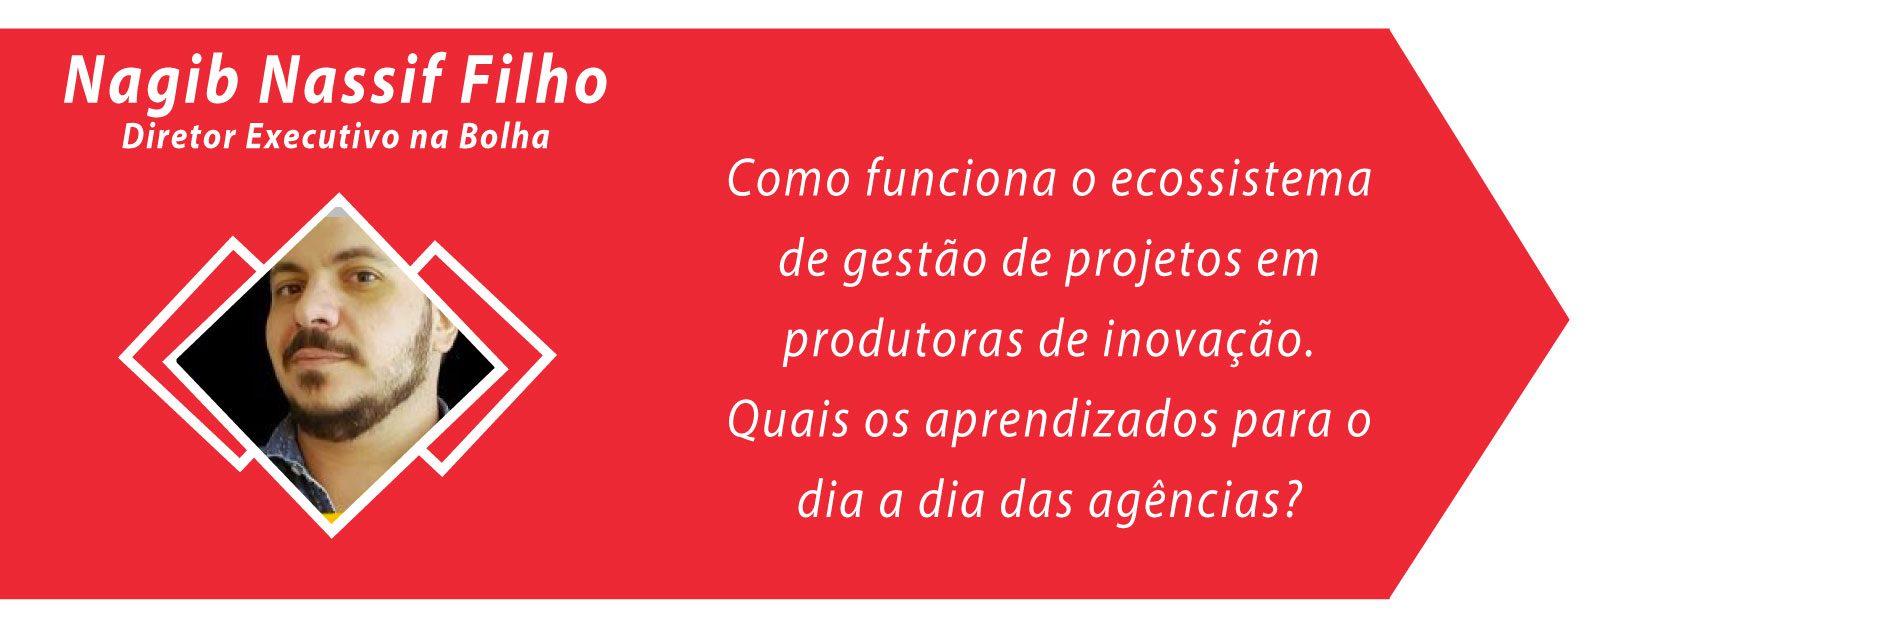 https://www.mestregp.com.br/wp-content/uploads/2016/10/Pagina-Colab-pt6-1900x631.jpg